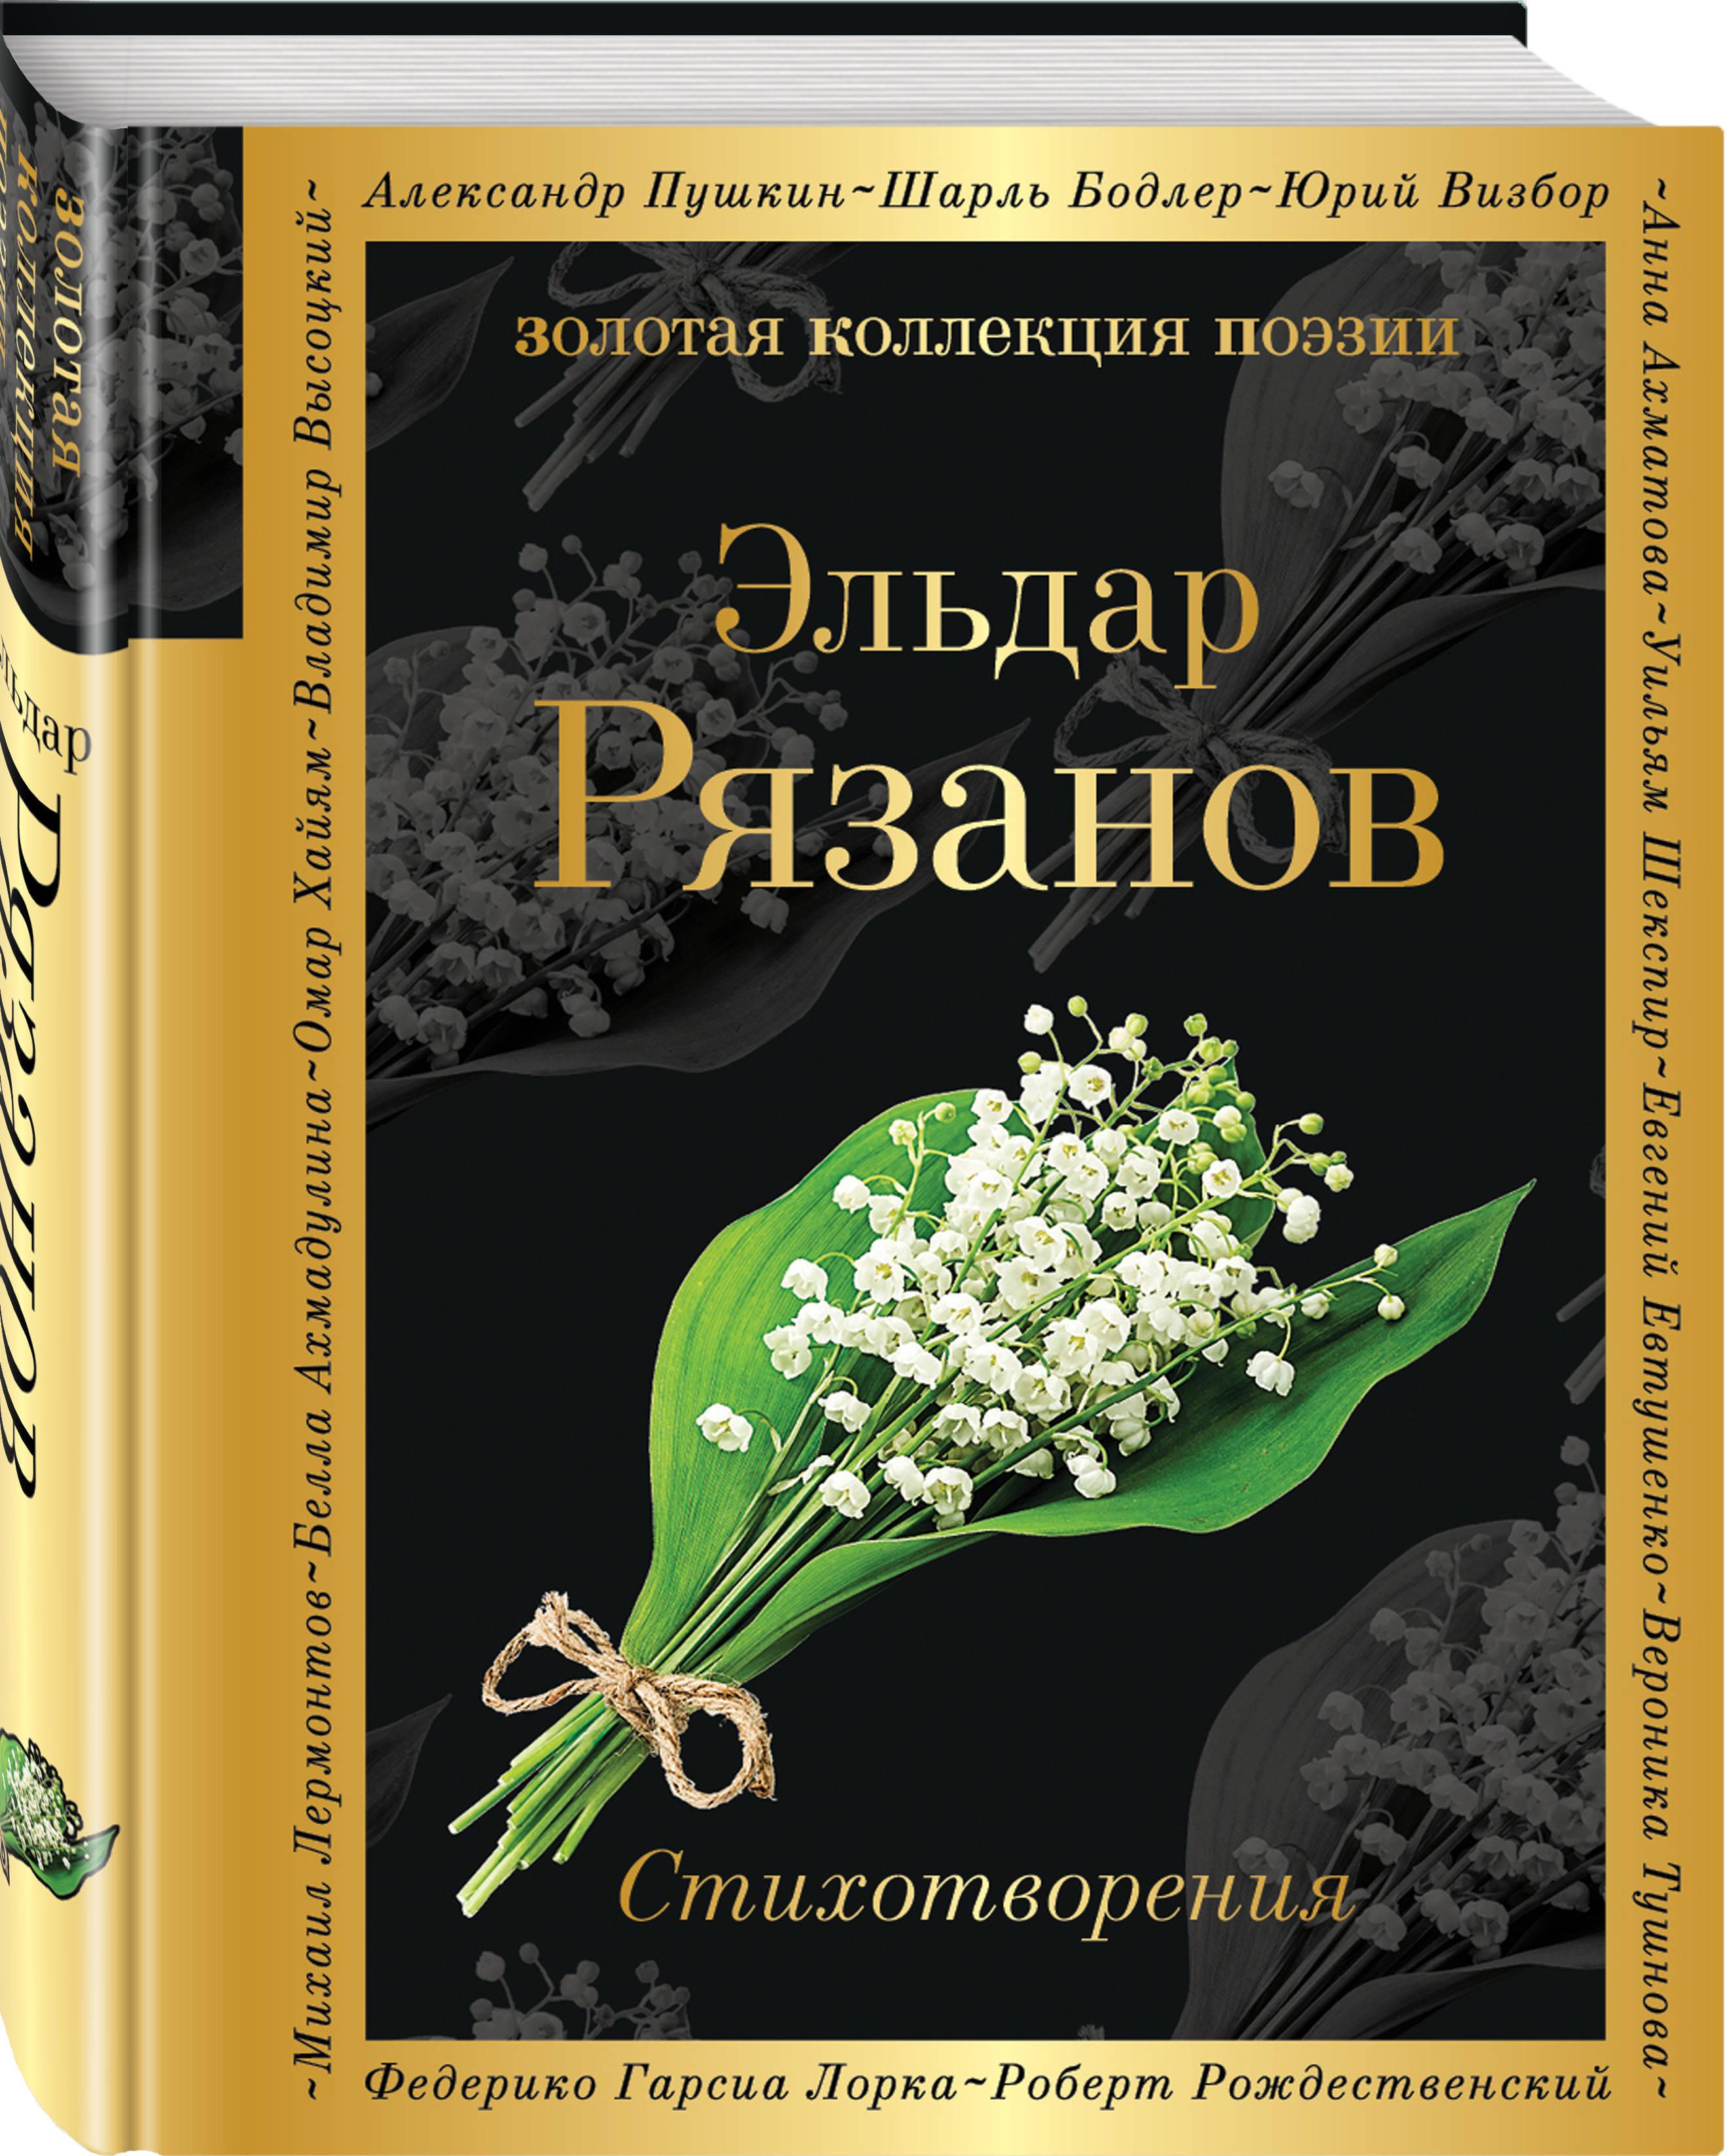 Стихотворения | Рязанов Эльдар Александрович